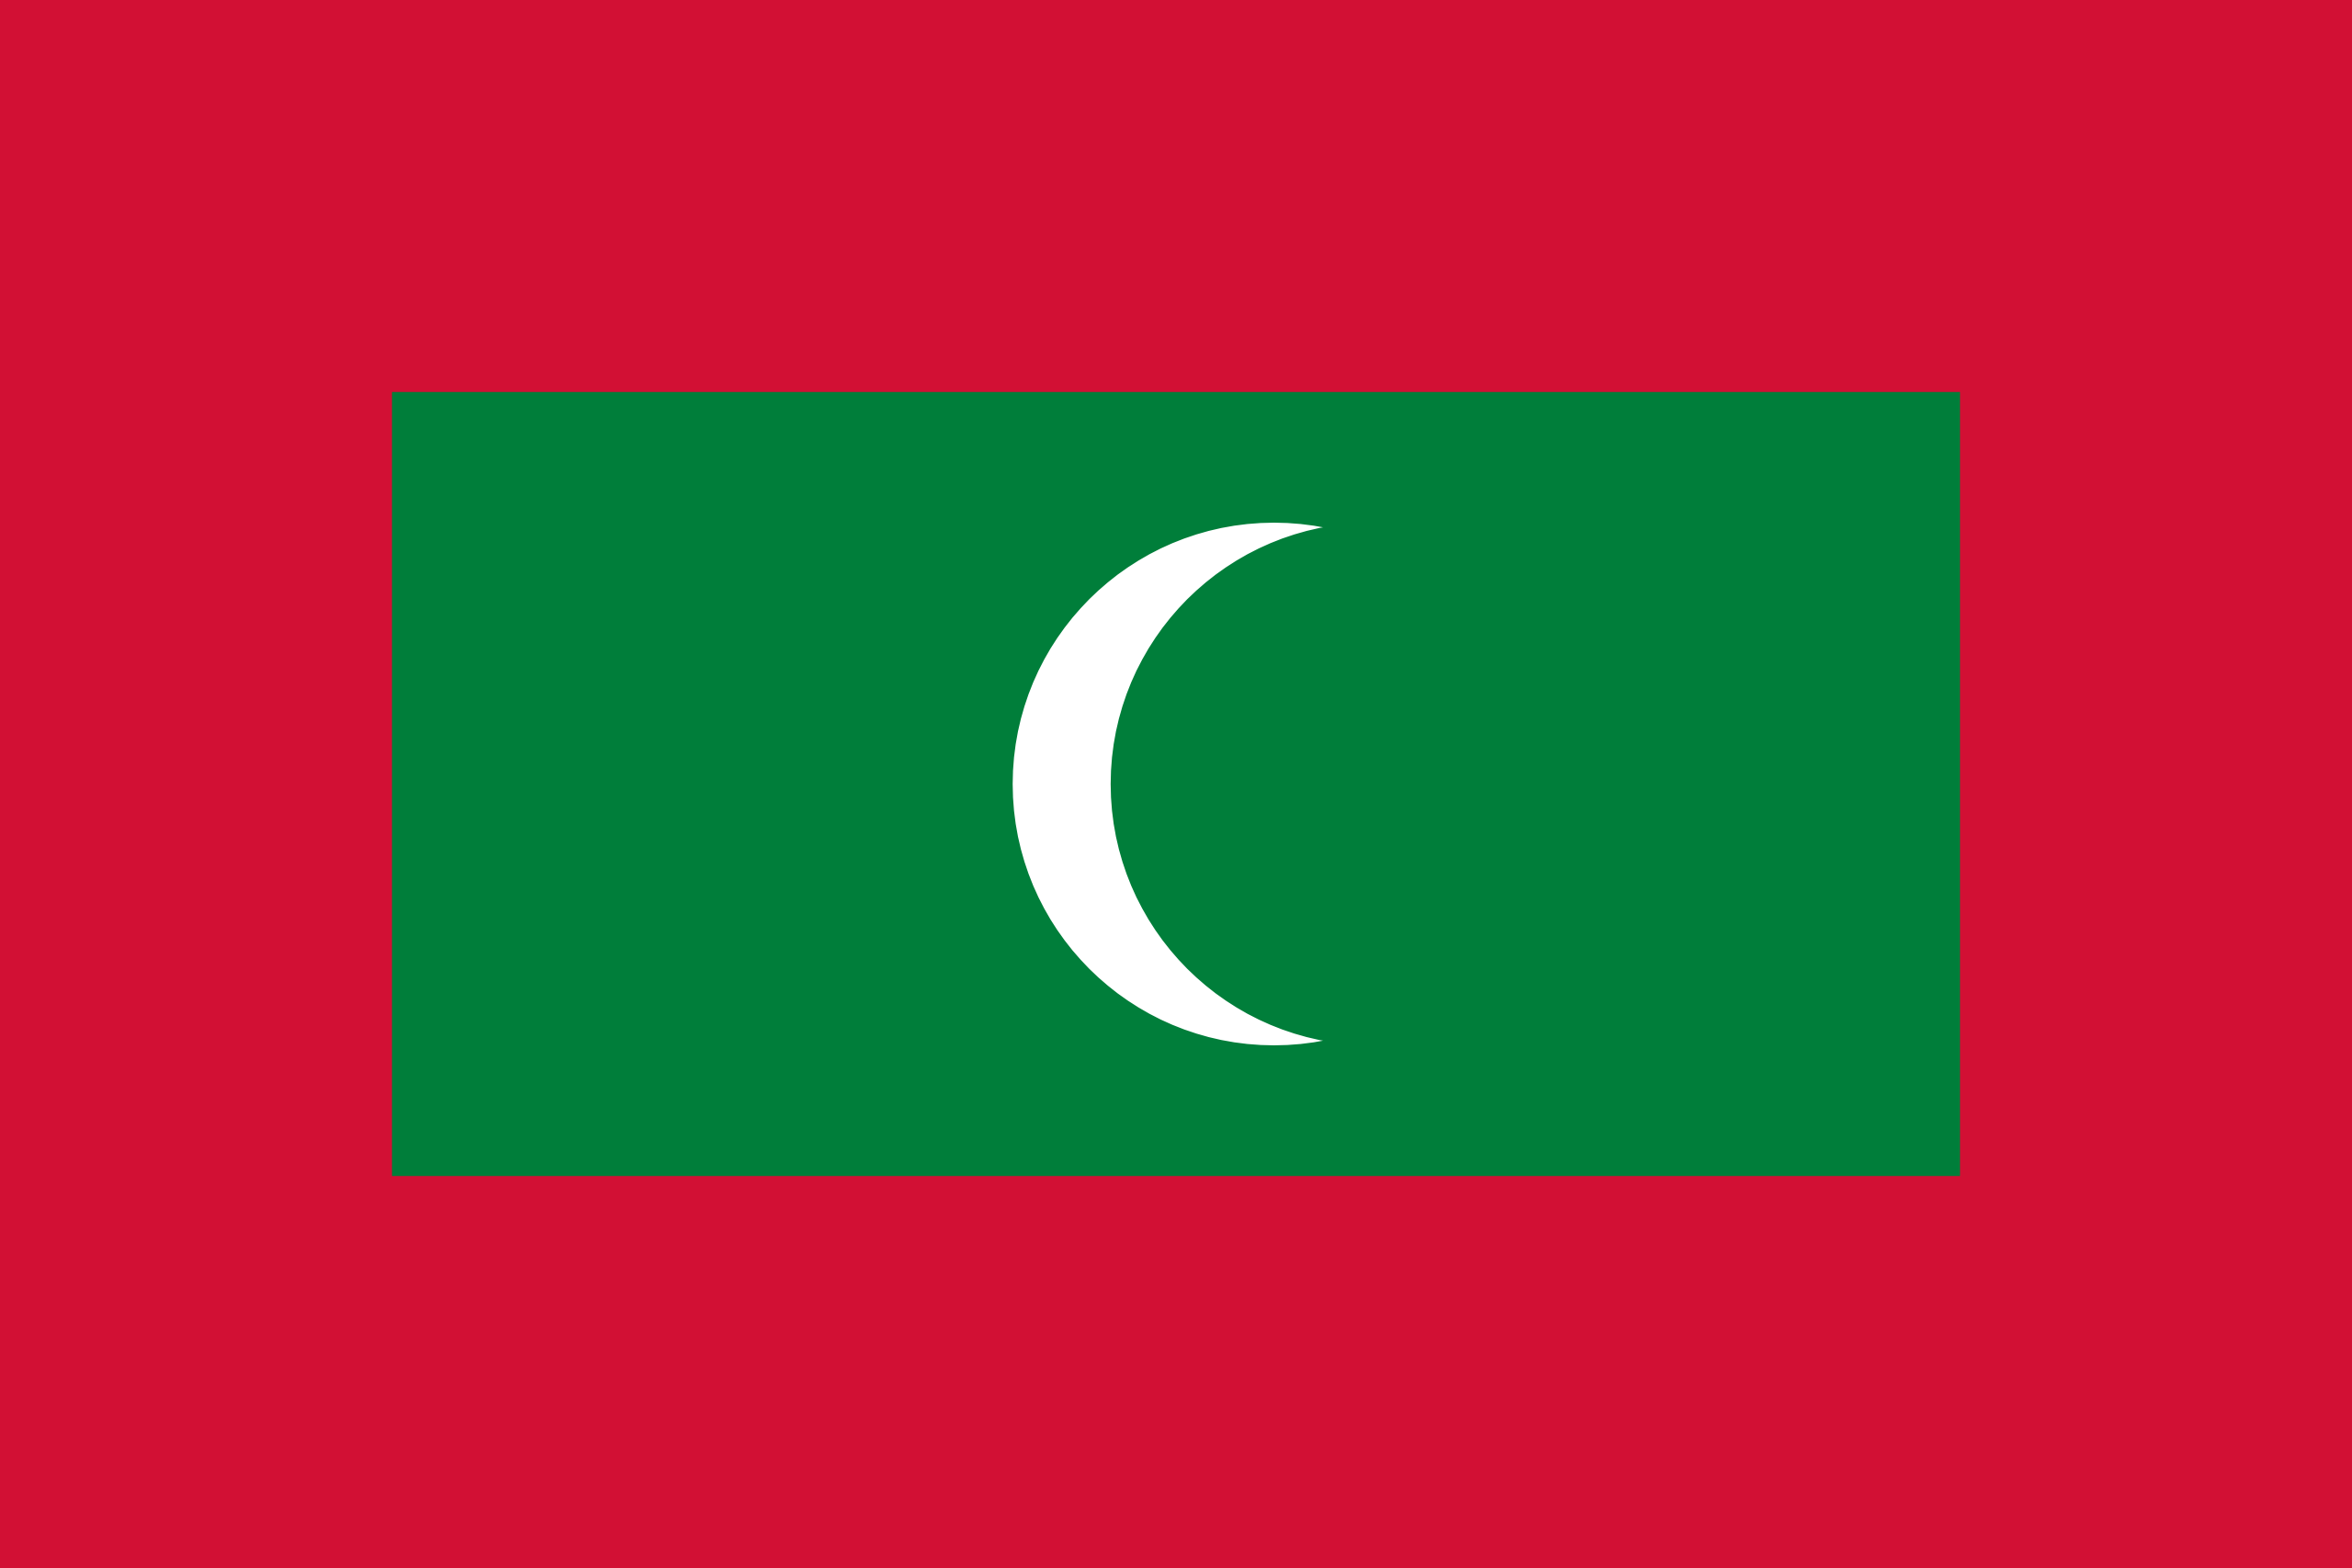 maldivas, país, emblema, insignia, प्रतीक - HD वॉलपेपर - प्रोफेसर-falken.com